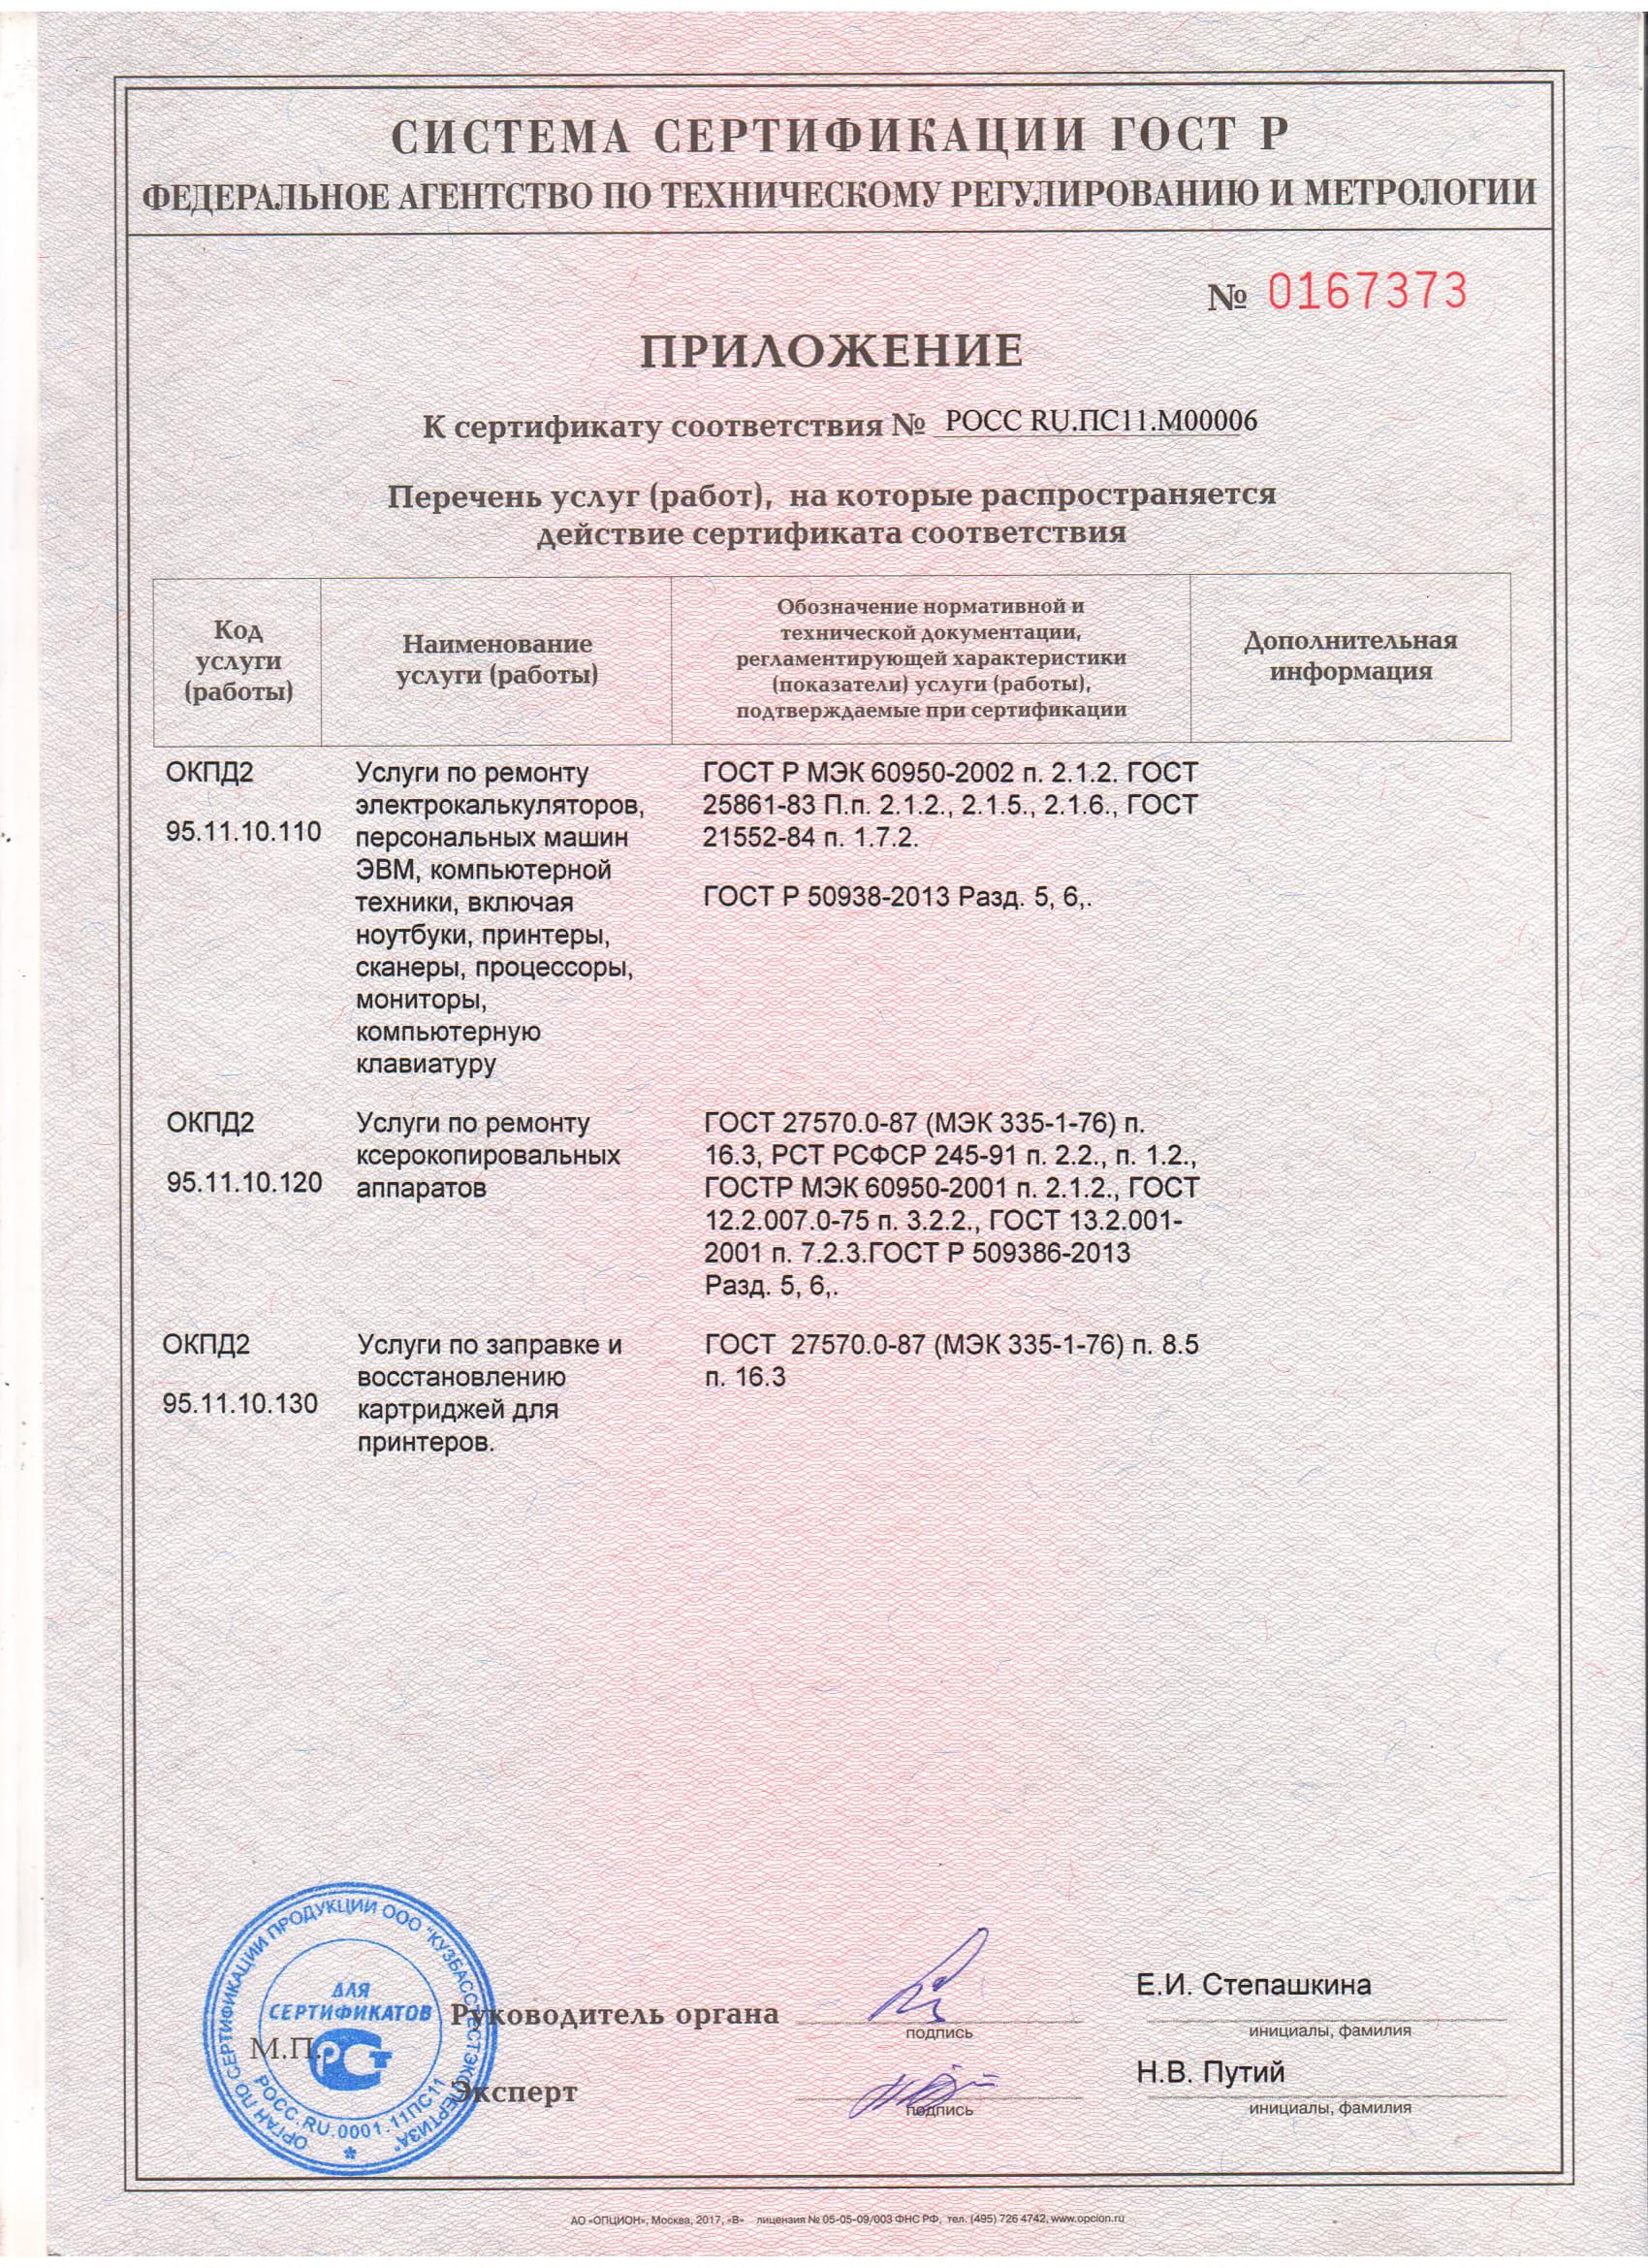 new sertificat 2